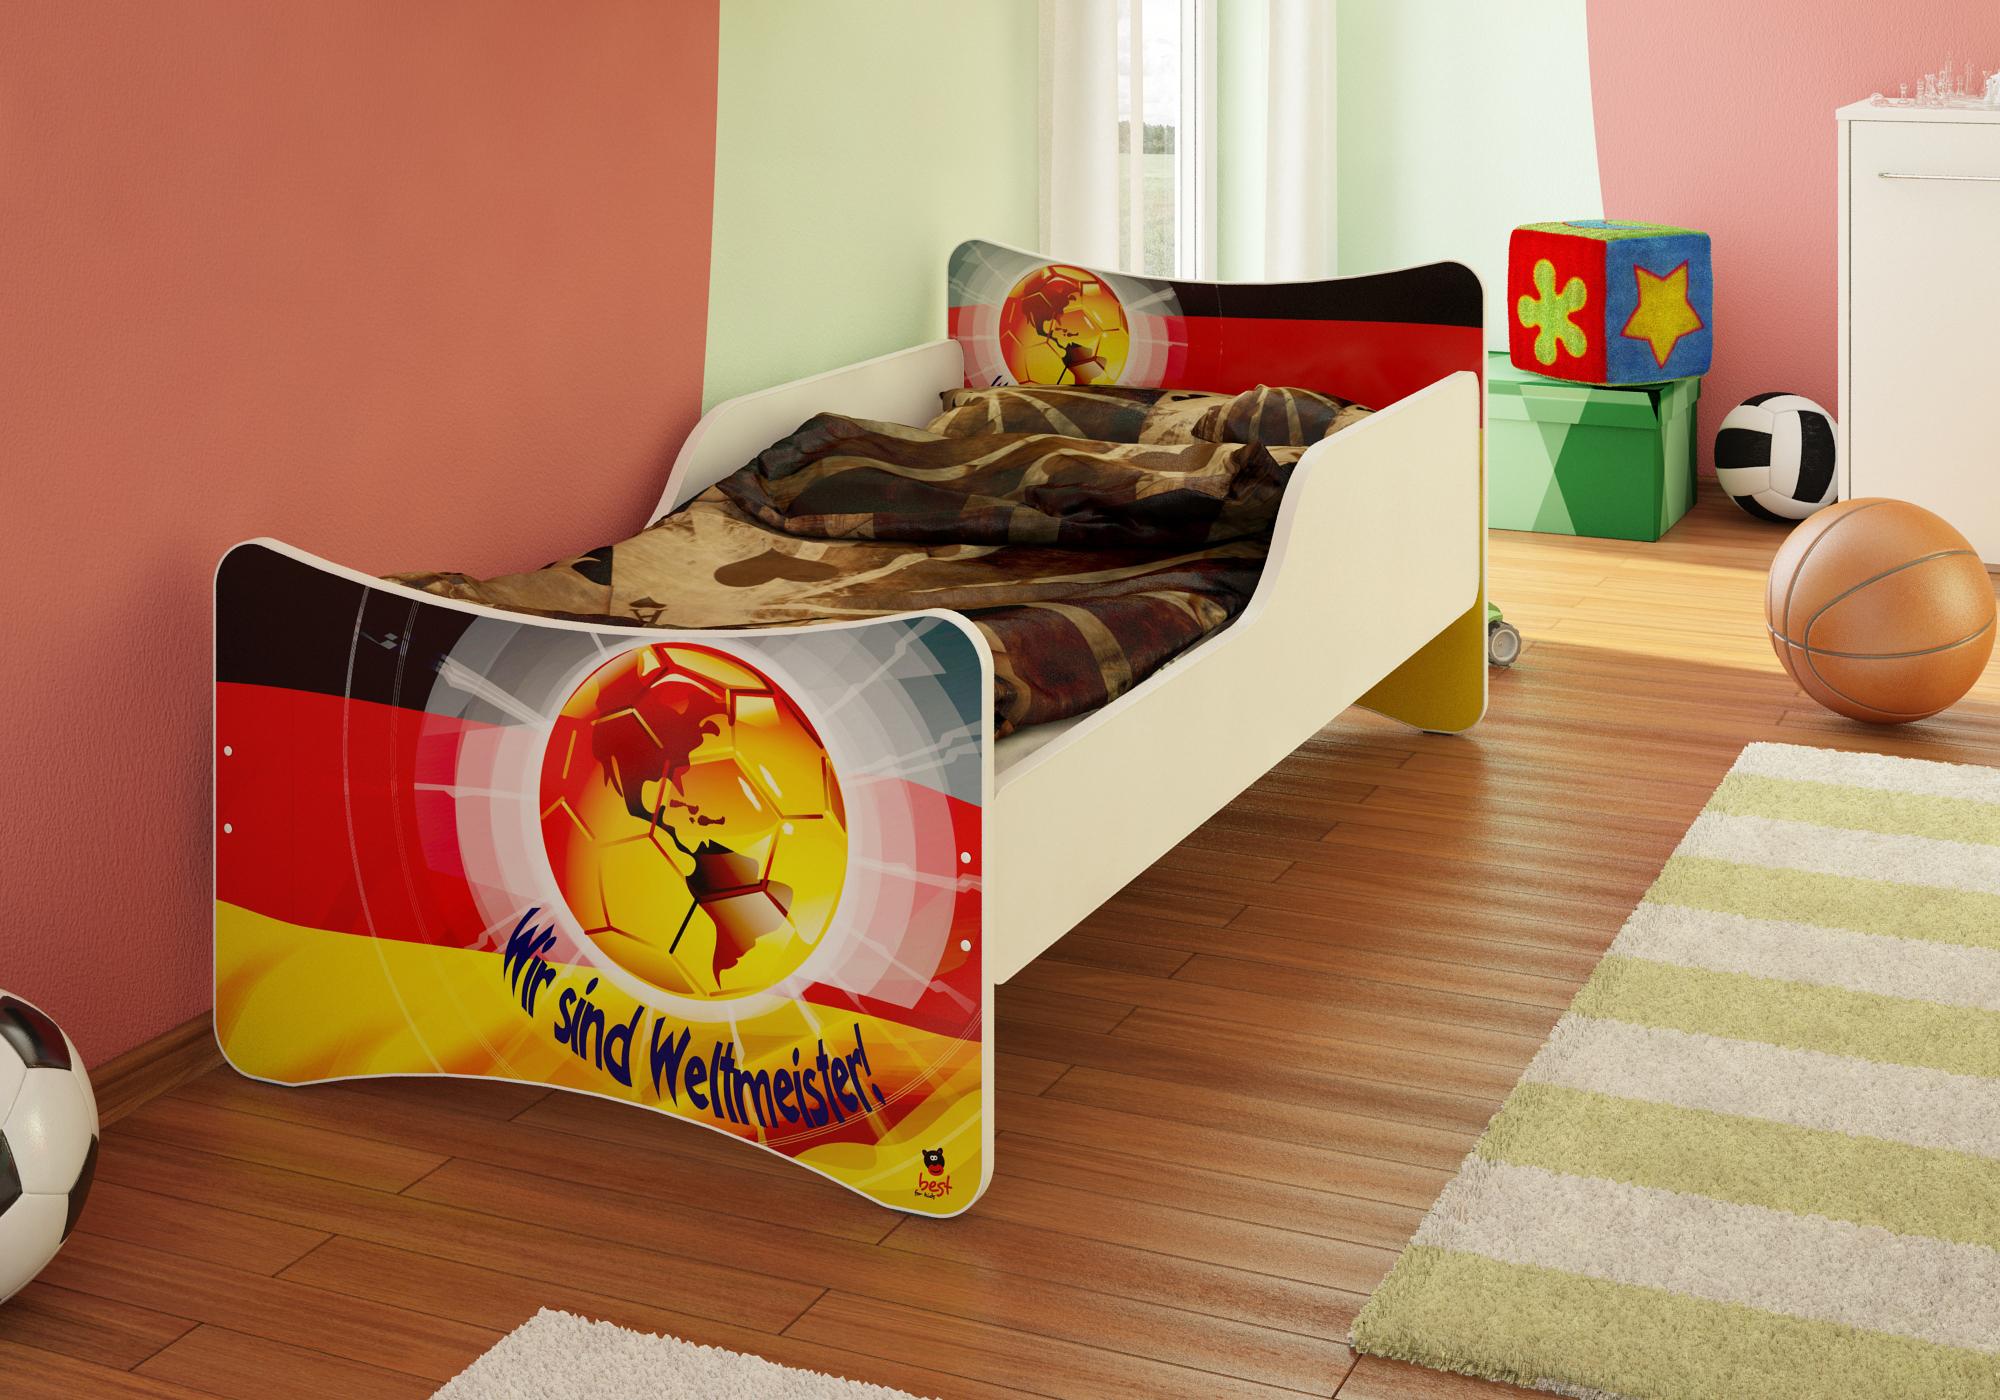 bfk weltmeister deutschland fu ball bett kinderbett 90x200. Black Bedroom Furniture Sets. Home Design Ideas